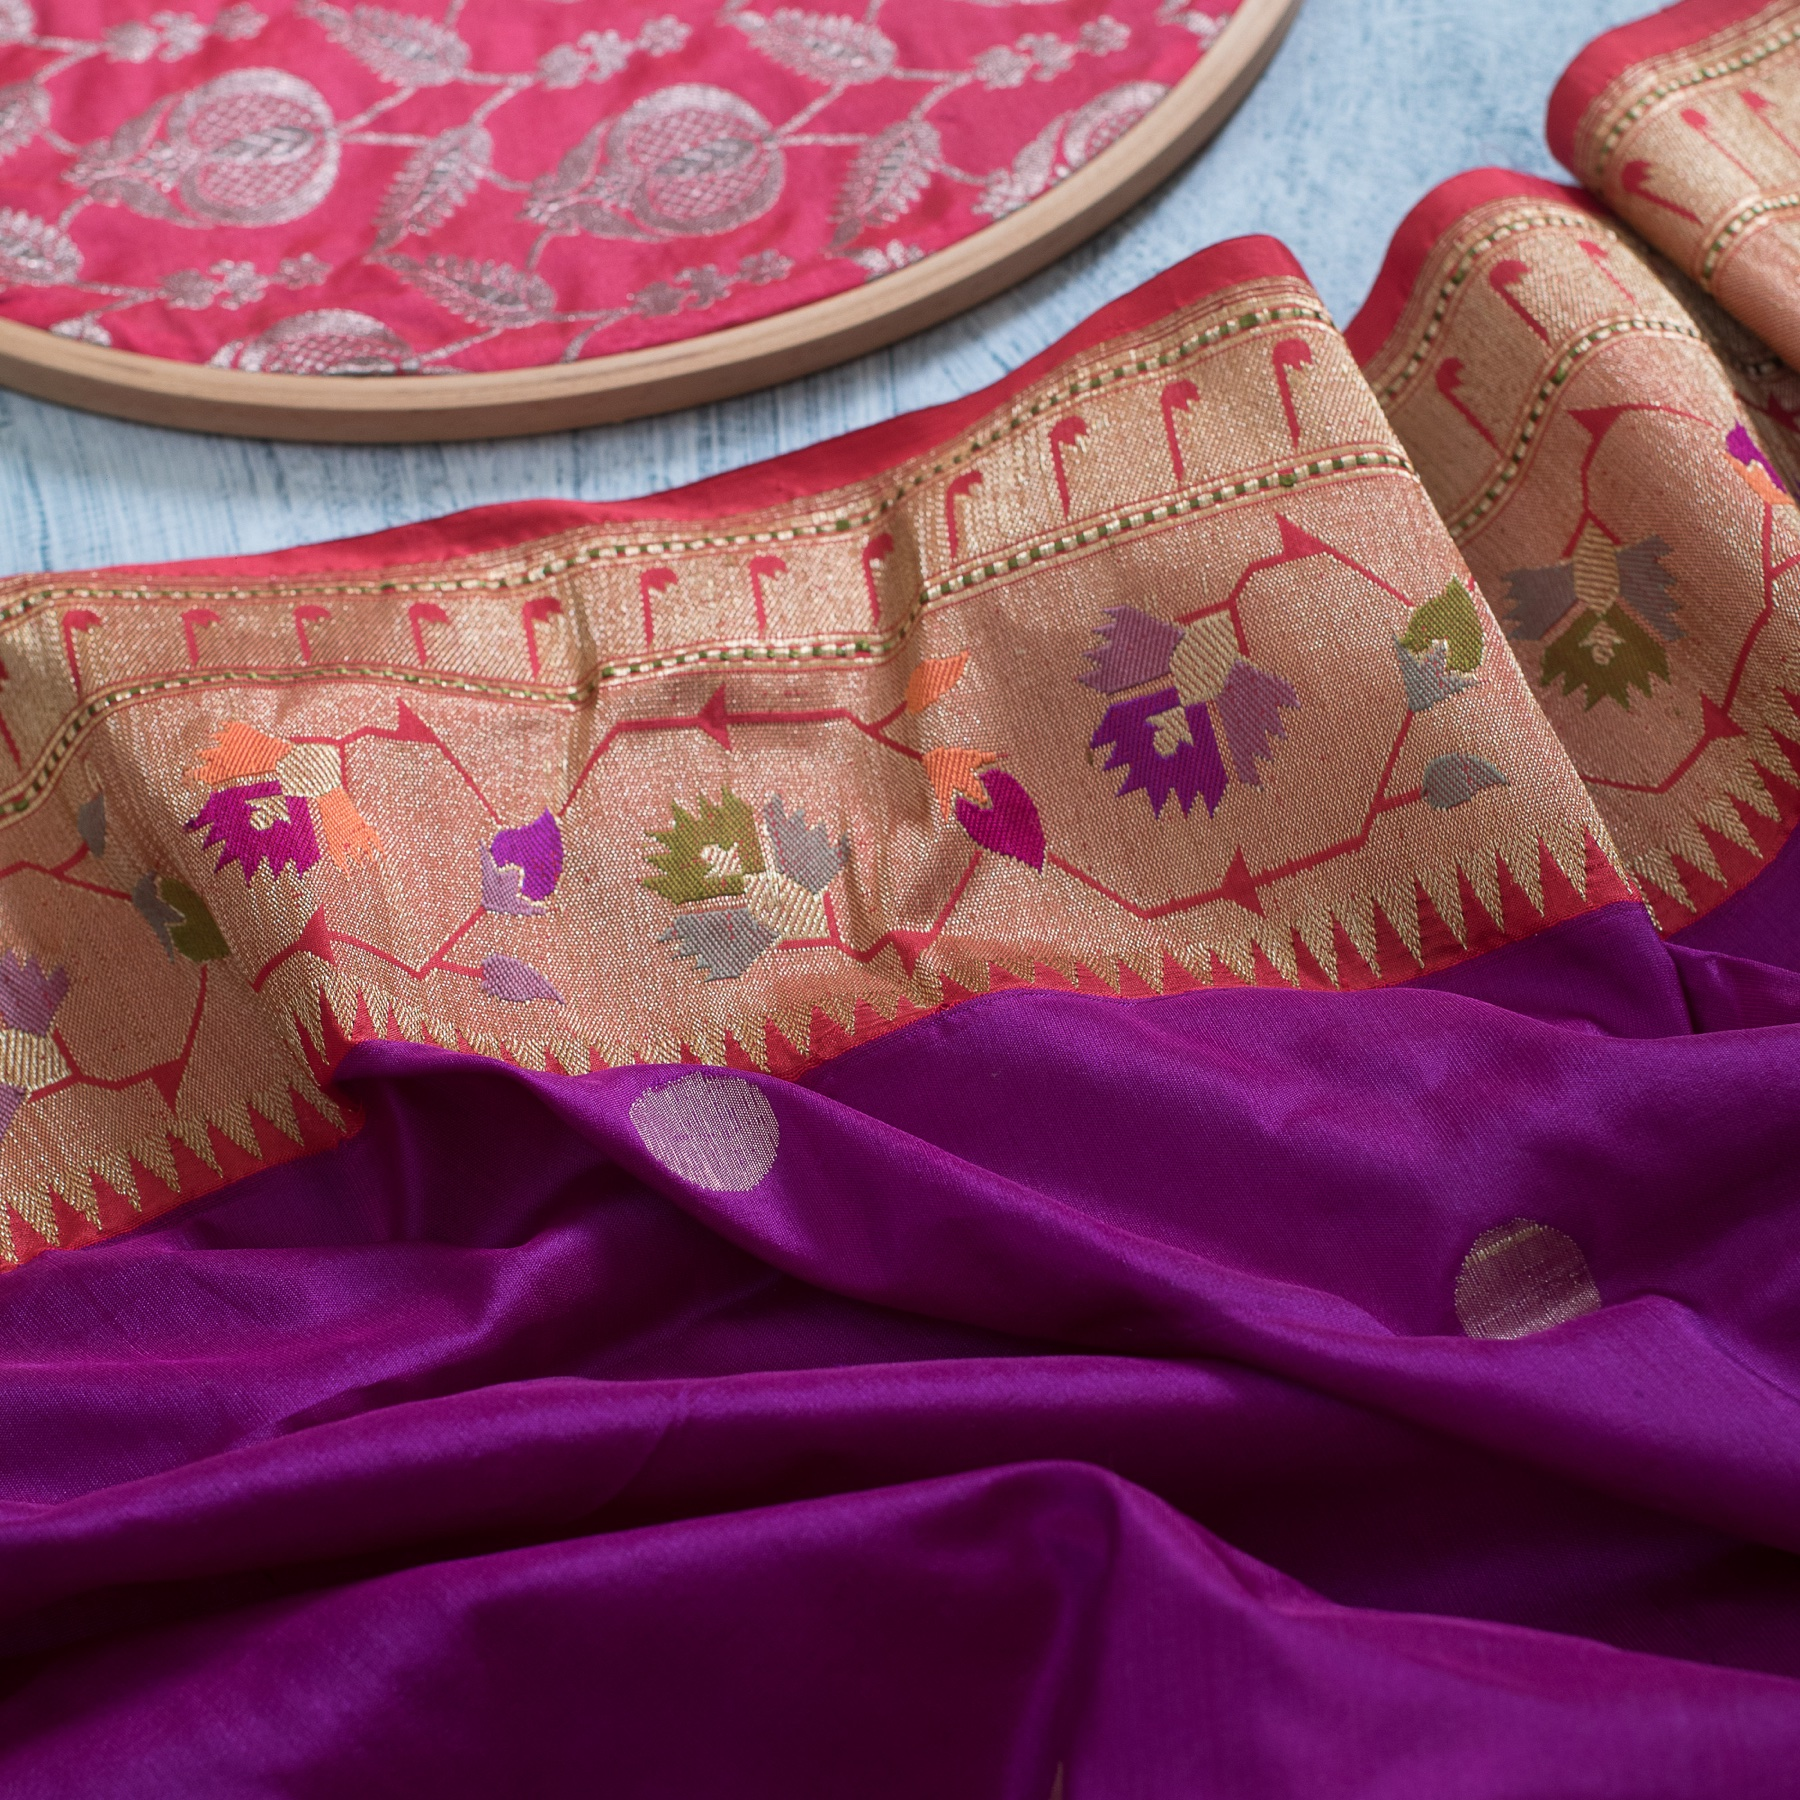 wedding-wear-pink-magenta-purple-textile-1594729-pxhere.com